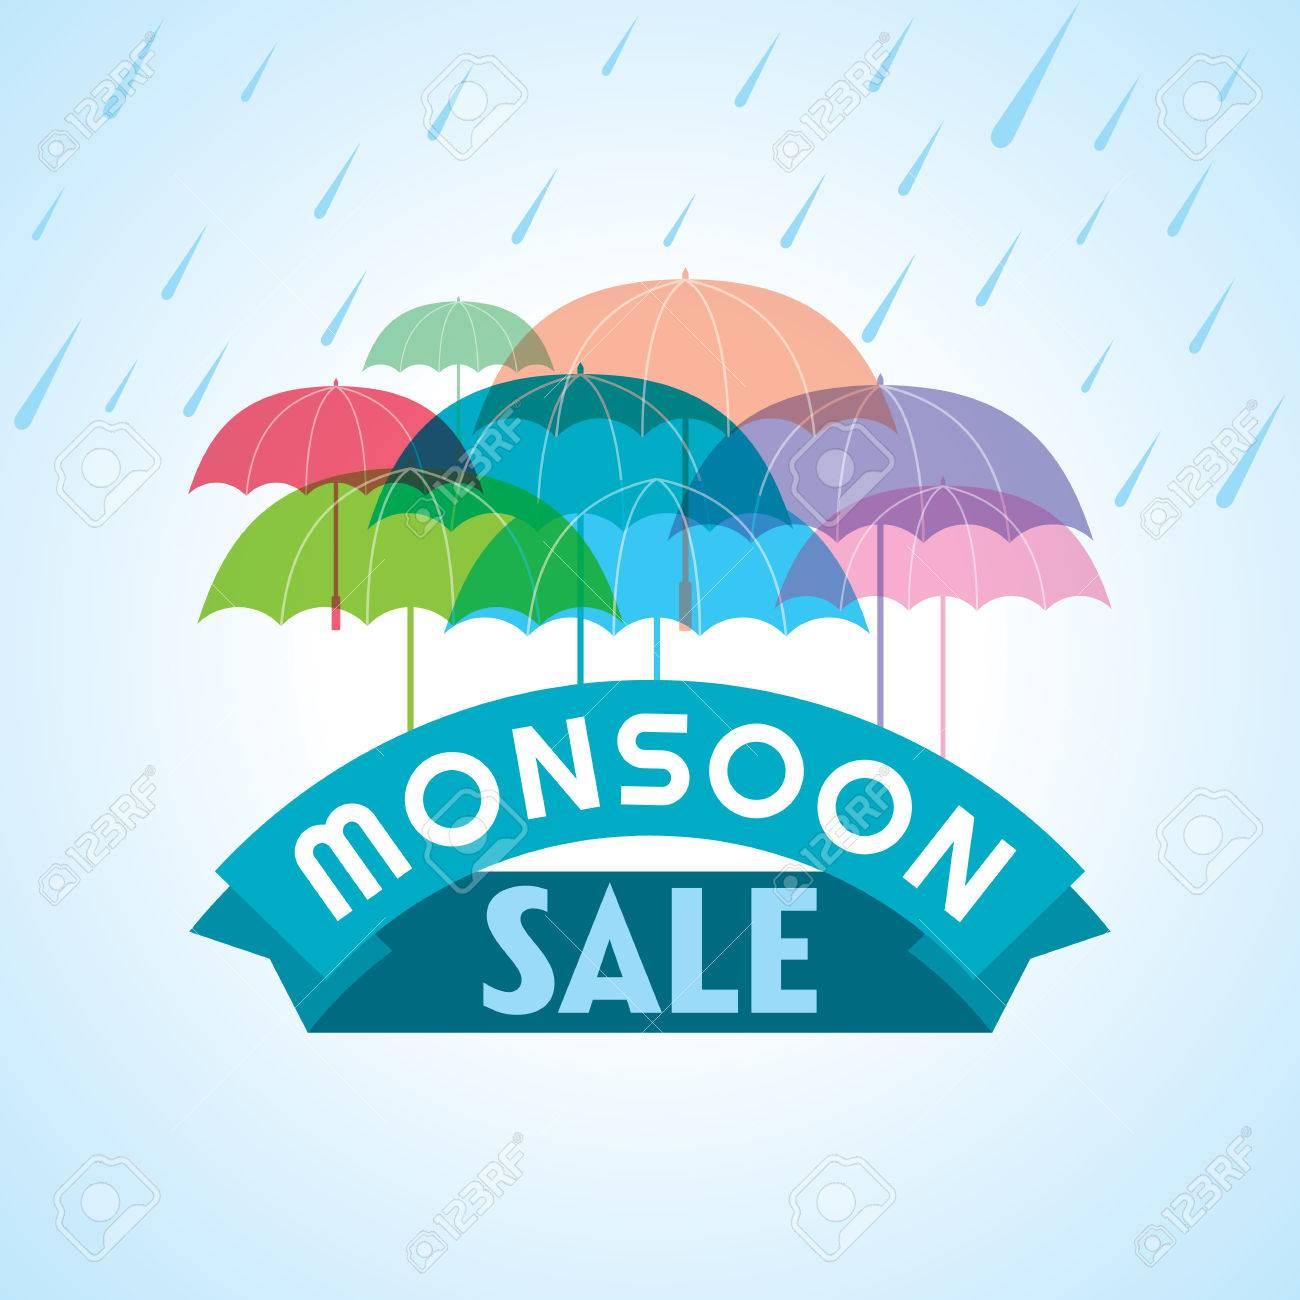 Monsoon offer and sale banner offer or poster. Standard-Bild - 41621319